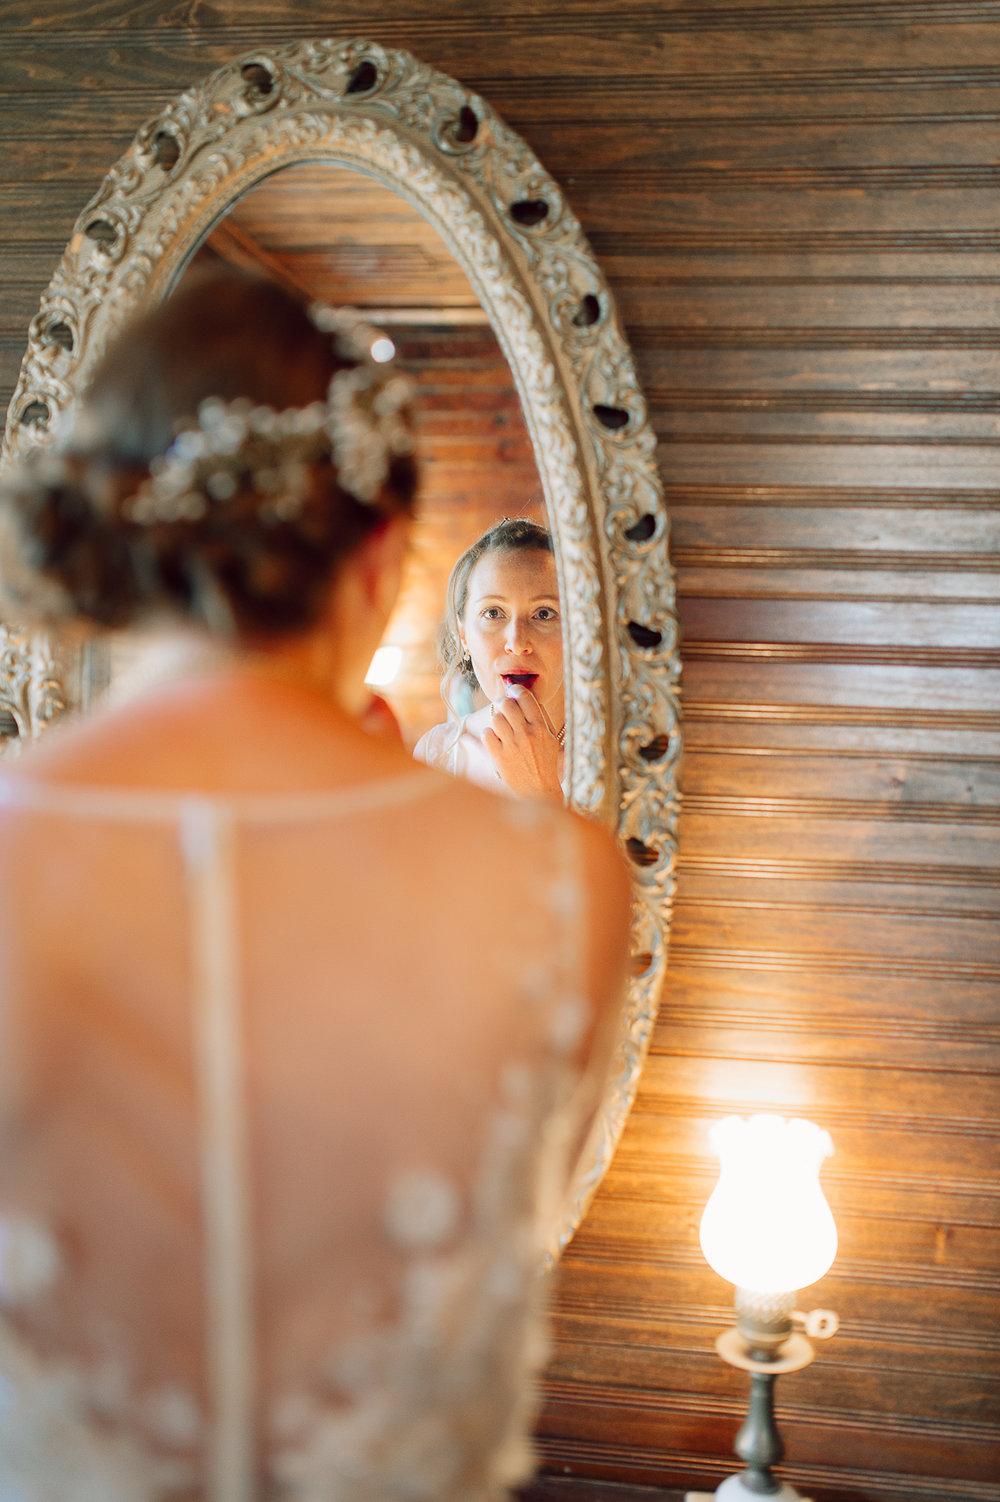 virginiawedding_theGlasgowFarm_rusticwedding_fredericksburg_youseephotography_CarolineDale (14).jpg